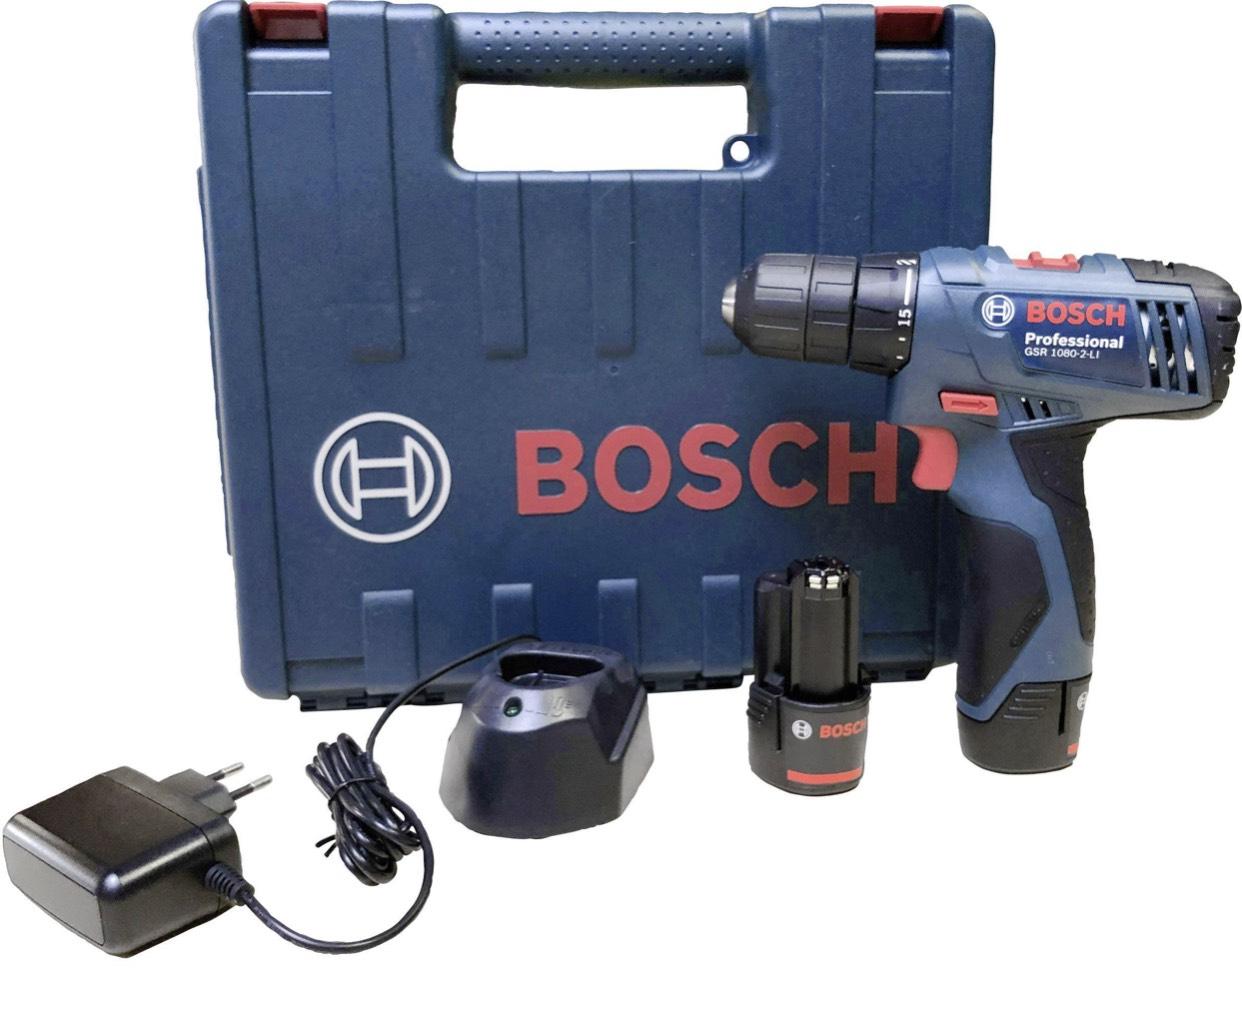 Bosch Professional Akku-Bohrschrauber 10.8 V 1.5 Ah inkl. 2. Akku